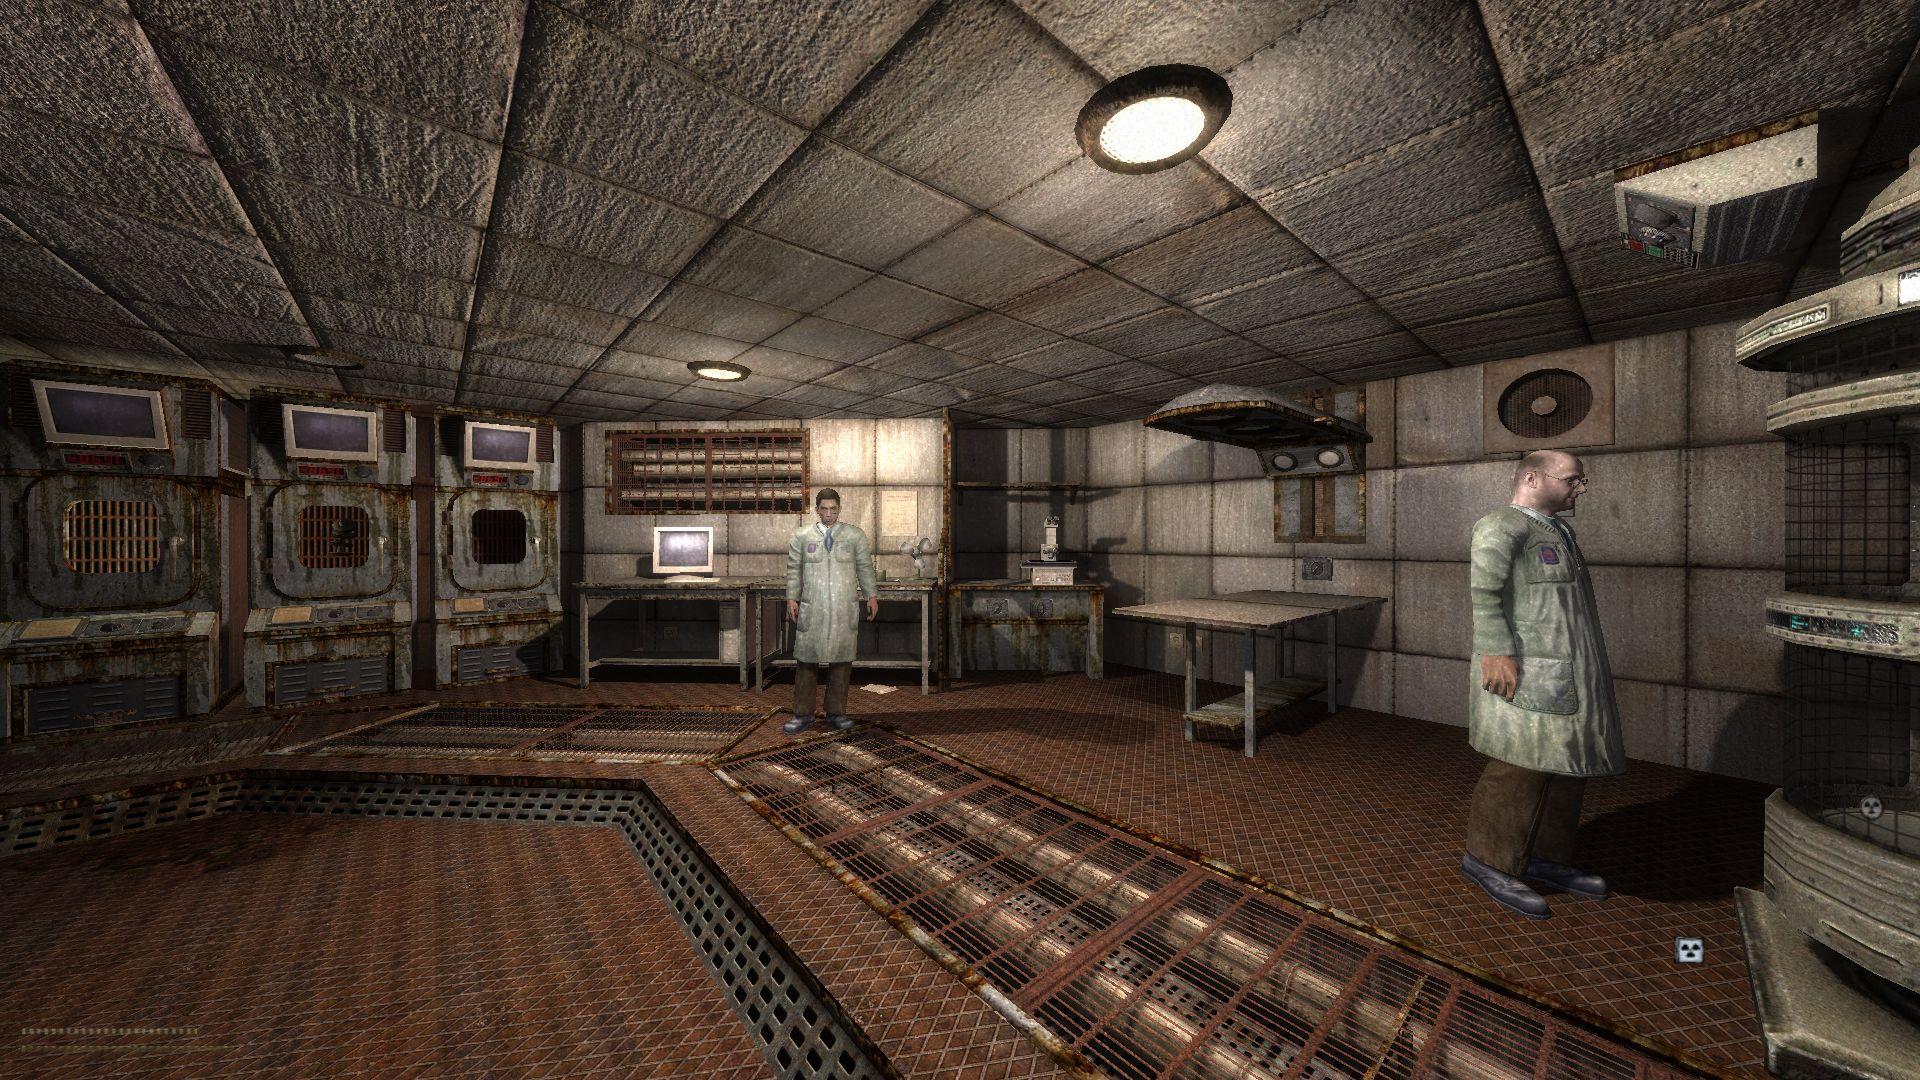 00007.Jpg - S.T.A.L.K.E.R.: Call of Pripyat